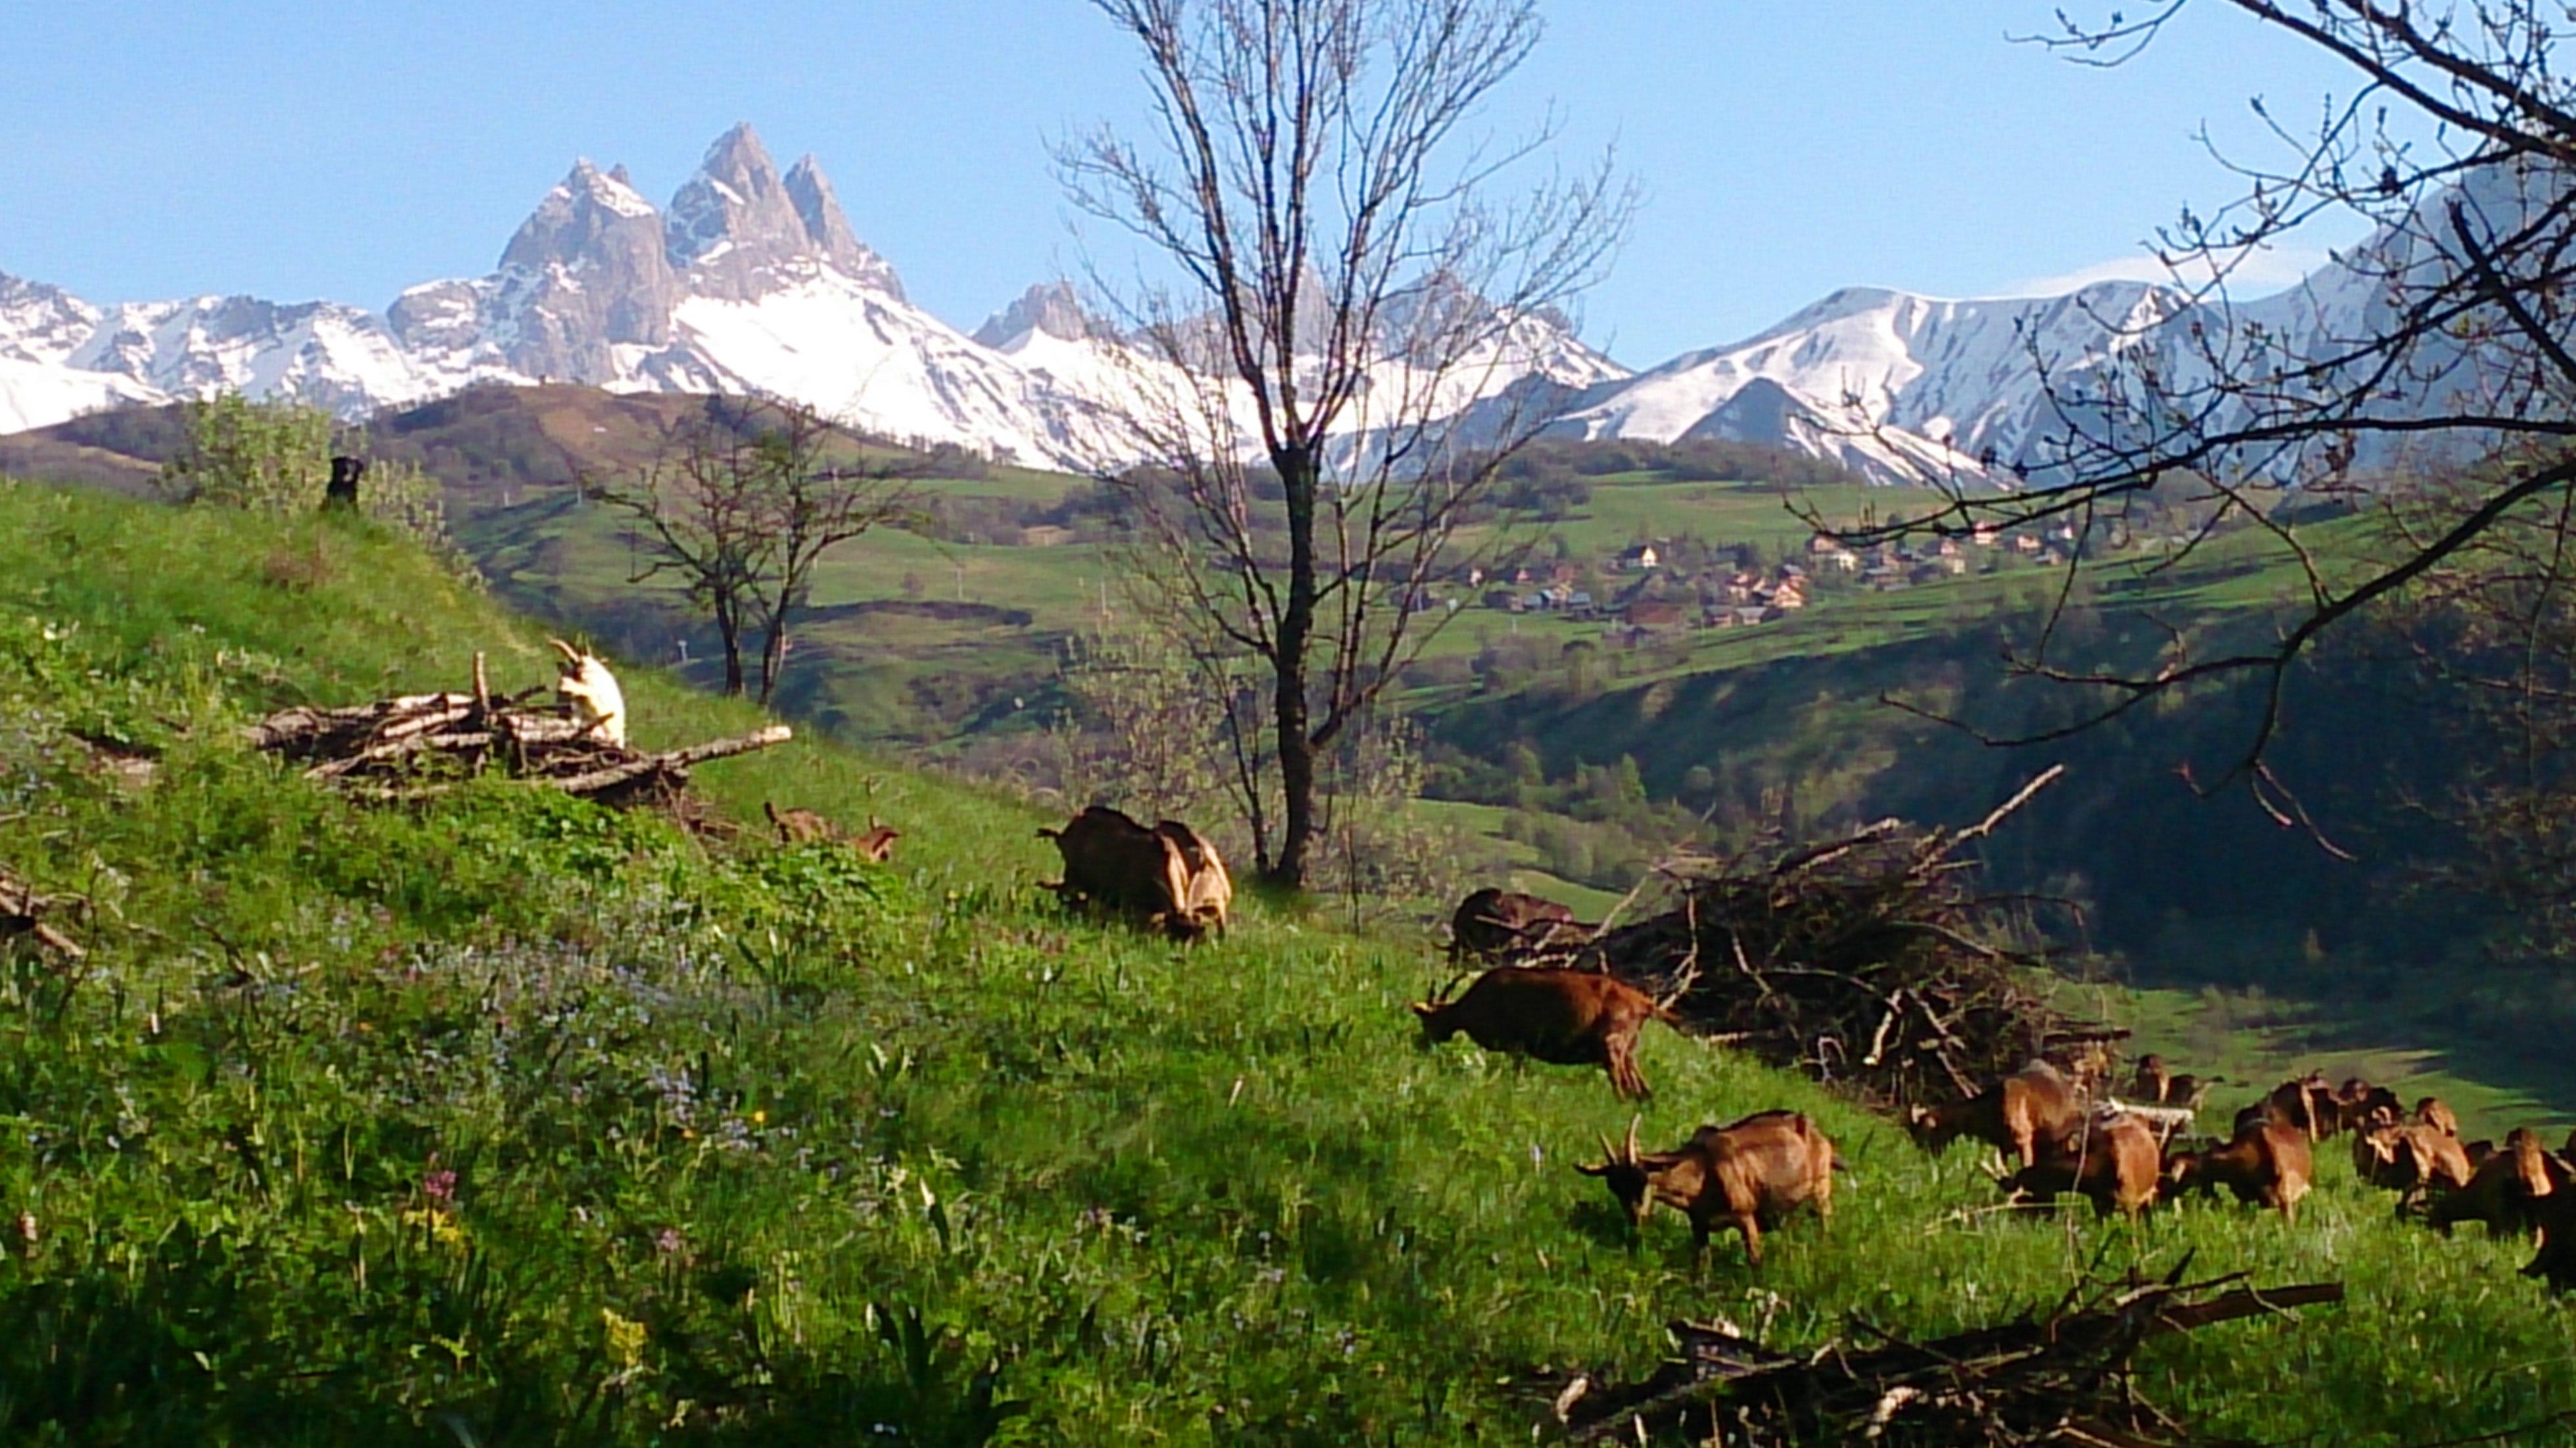 Chèvrerie de Champlan © Nicolas Wax